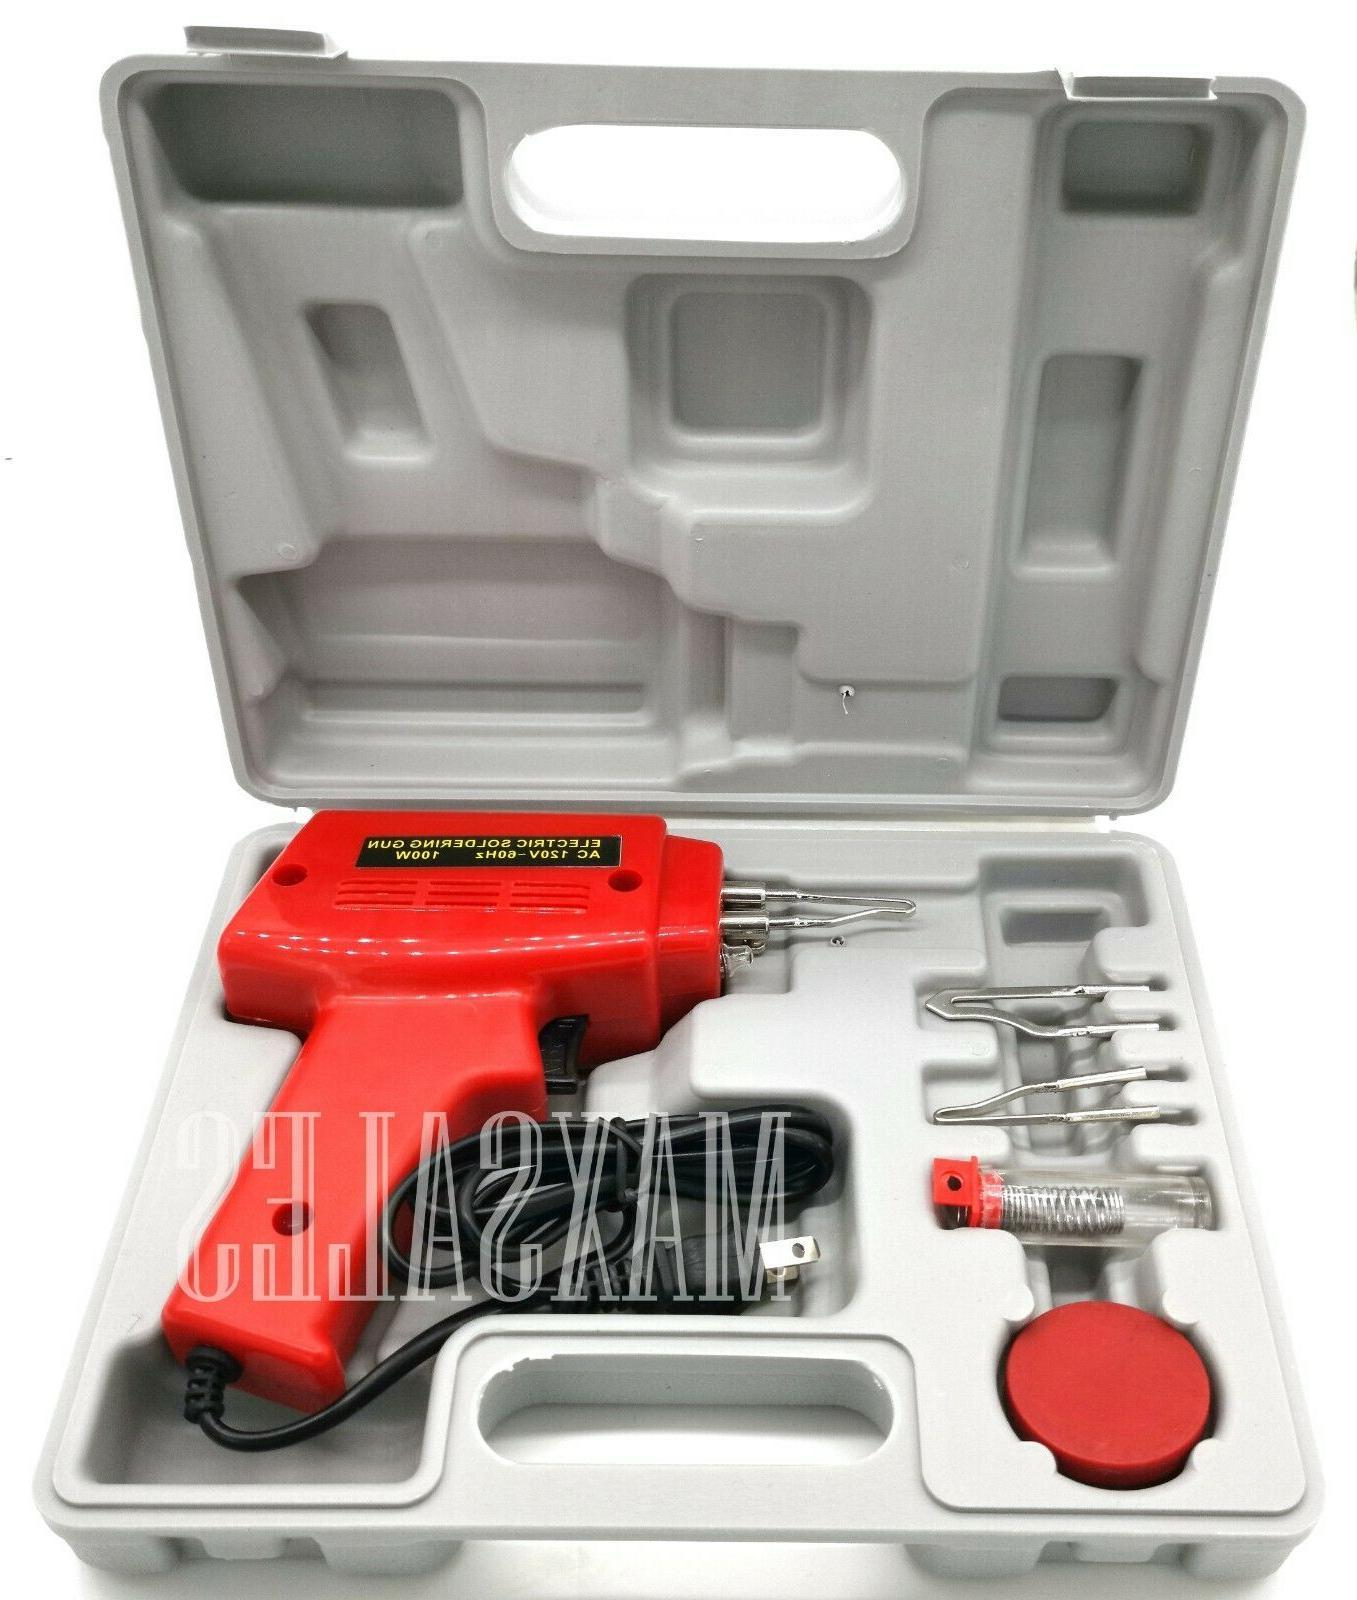 New 5pc 100W Soldering Gun Kit w/Case Iron Solder Profession